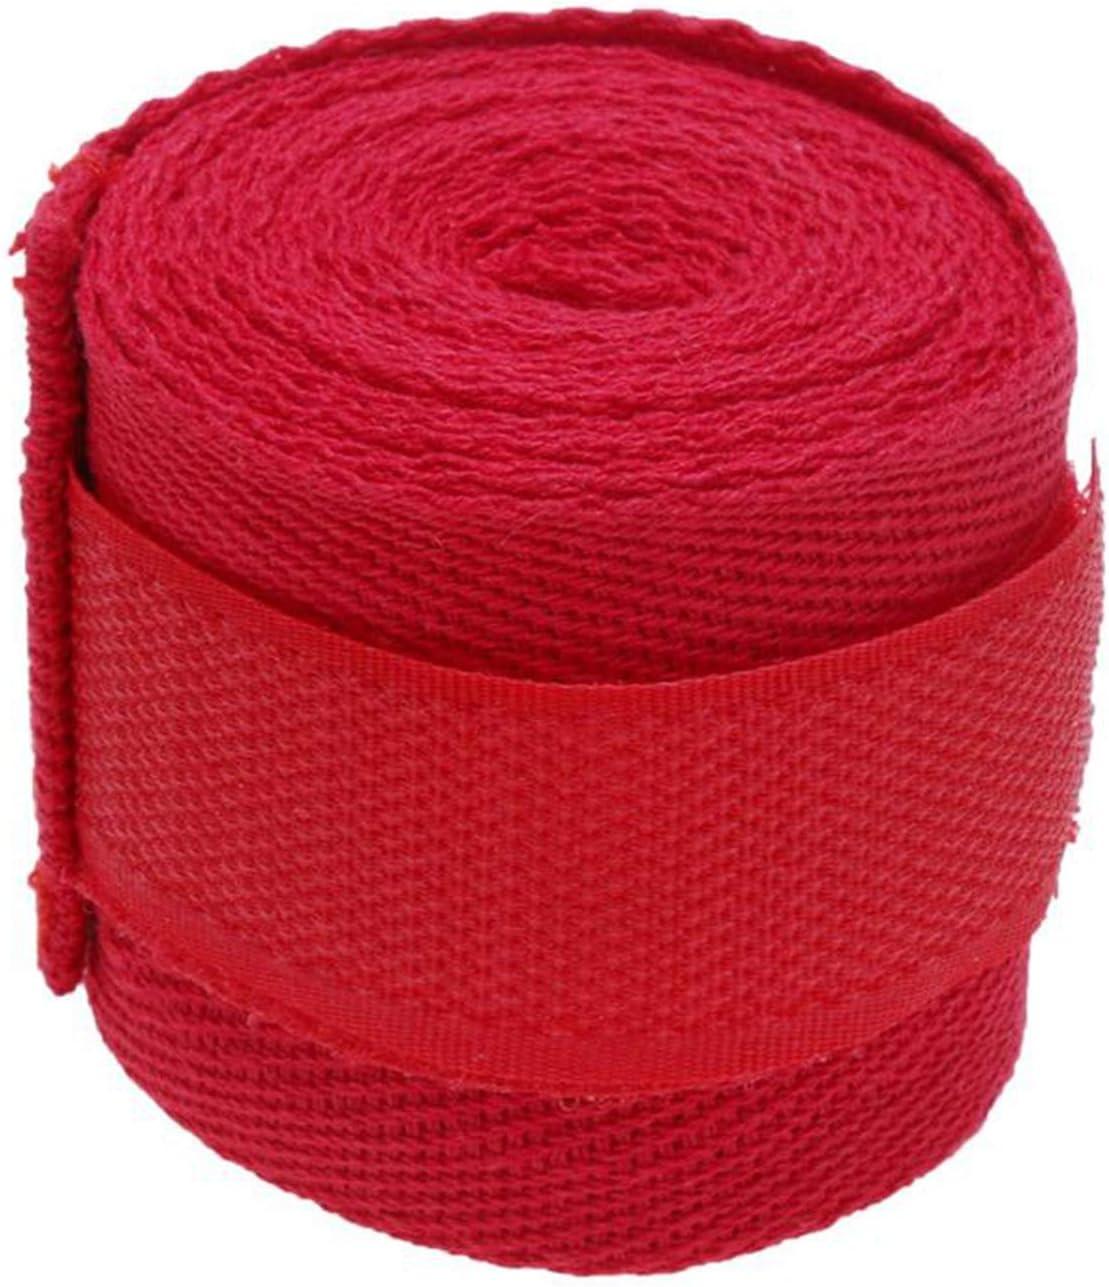 Tiamu 1 Pc 2.5M Eslatic Cotton Sports Strap Boxing Bandage For Sanda Muay Thai Mma Taekwondo Hand Gloves Wraps